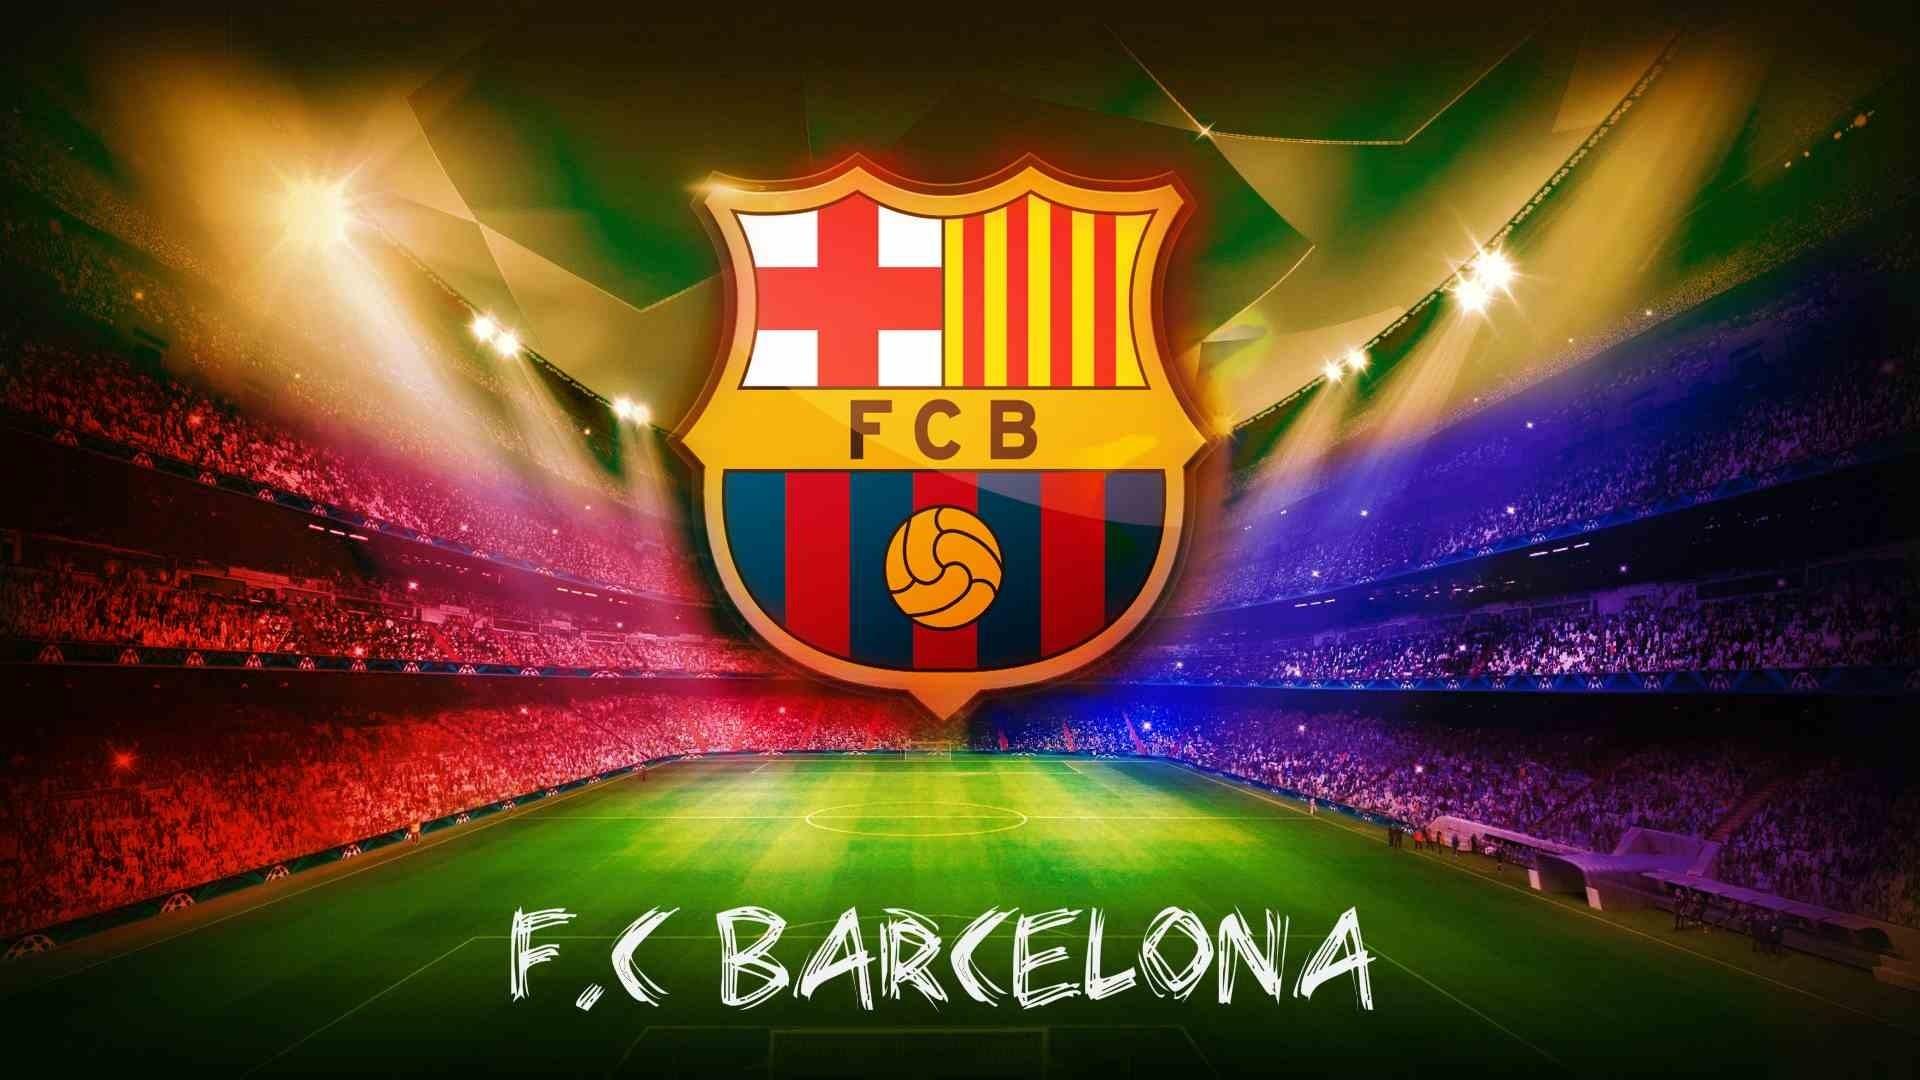 Beautiful Fc Barcelona Wallpapers Iphone 6 HJS7